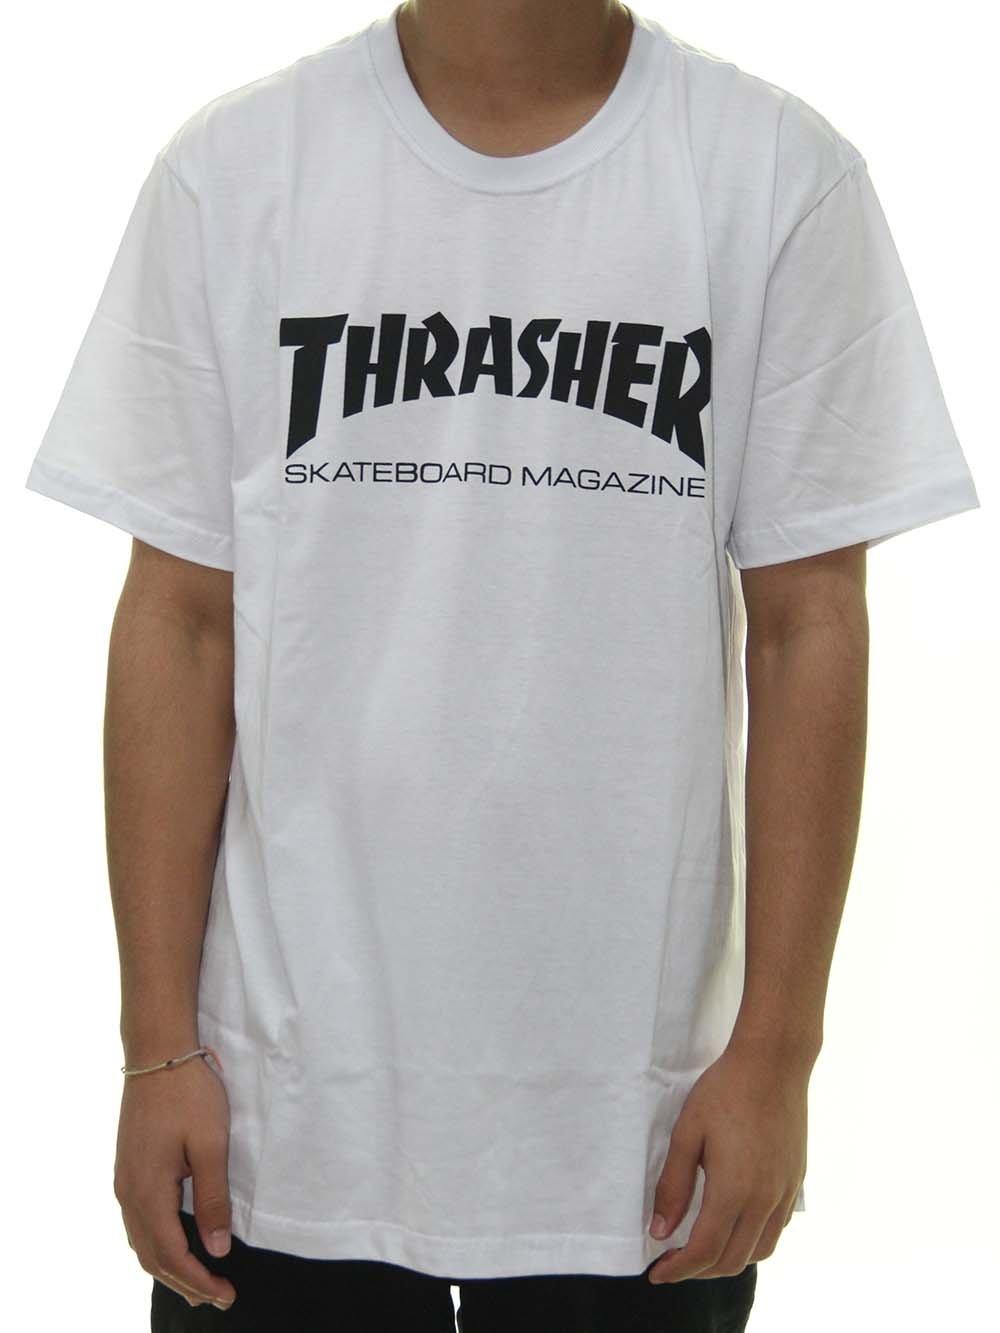 CAMISETA THRASHER TH30004 - BCO/PTO